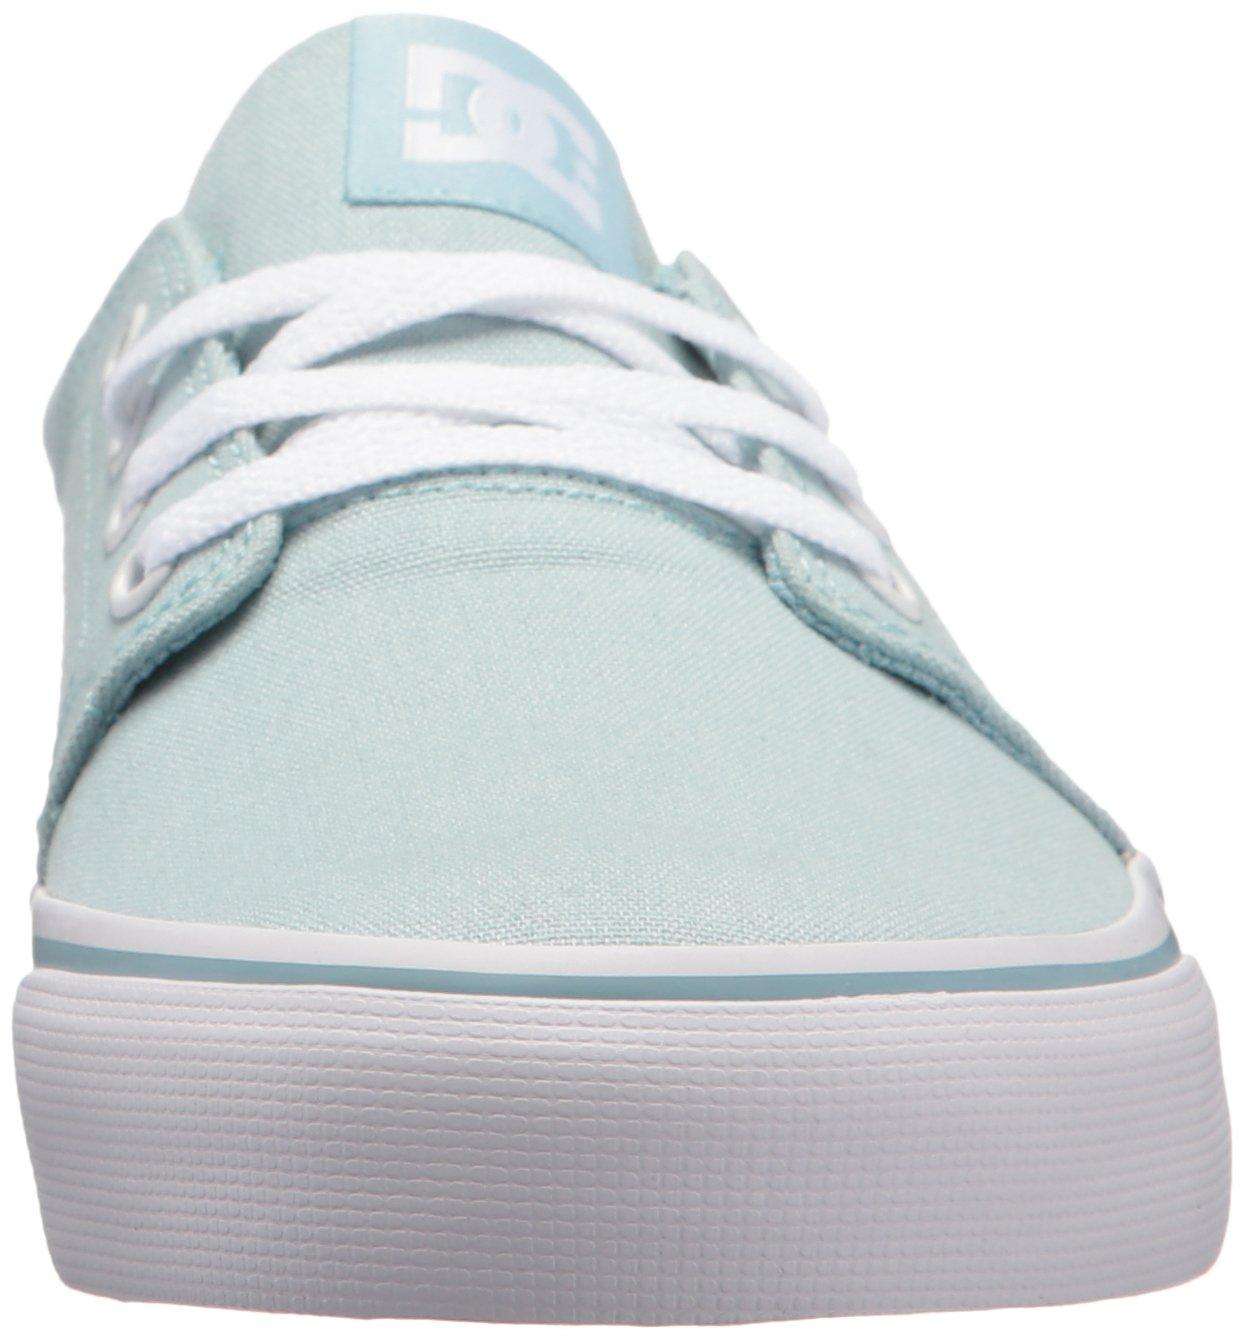 DC TX dámské tričko modrá TX Skate Skate Shoe Světle modrá 267d14f ... 02282251ef